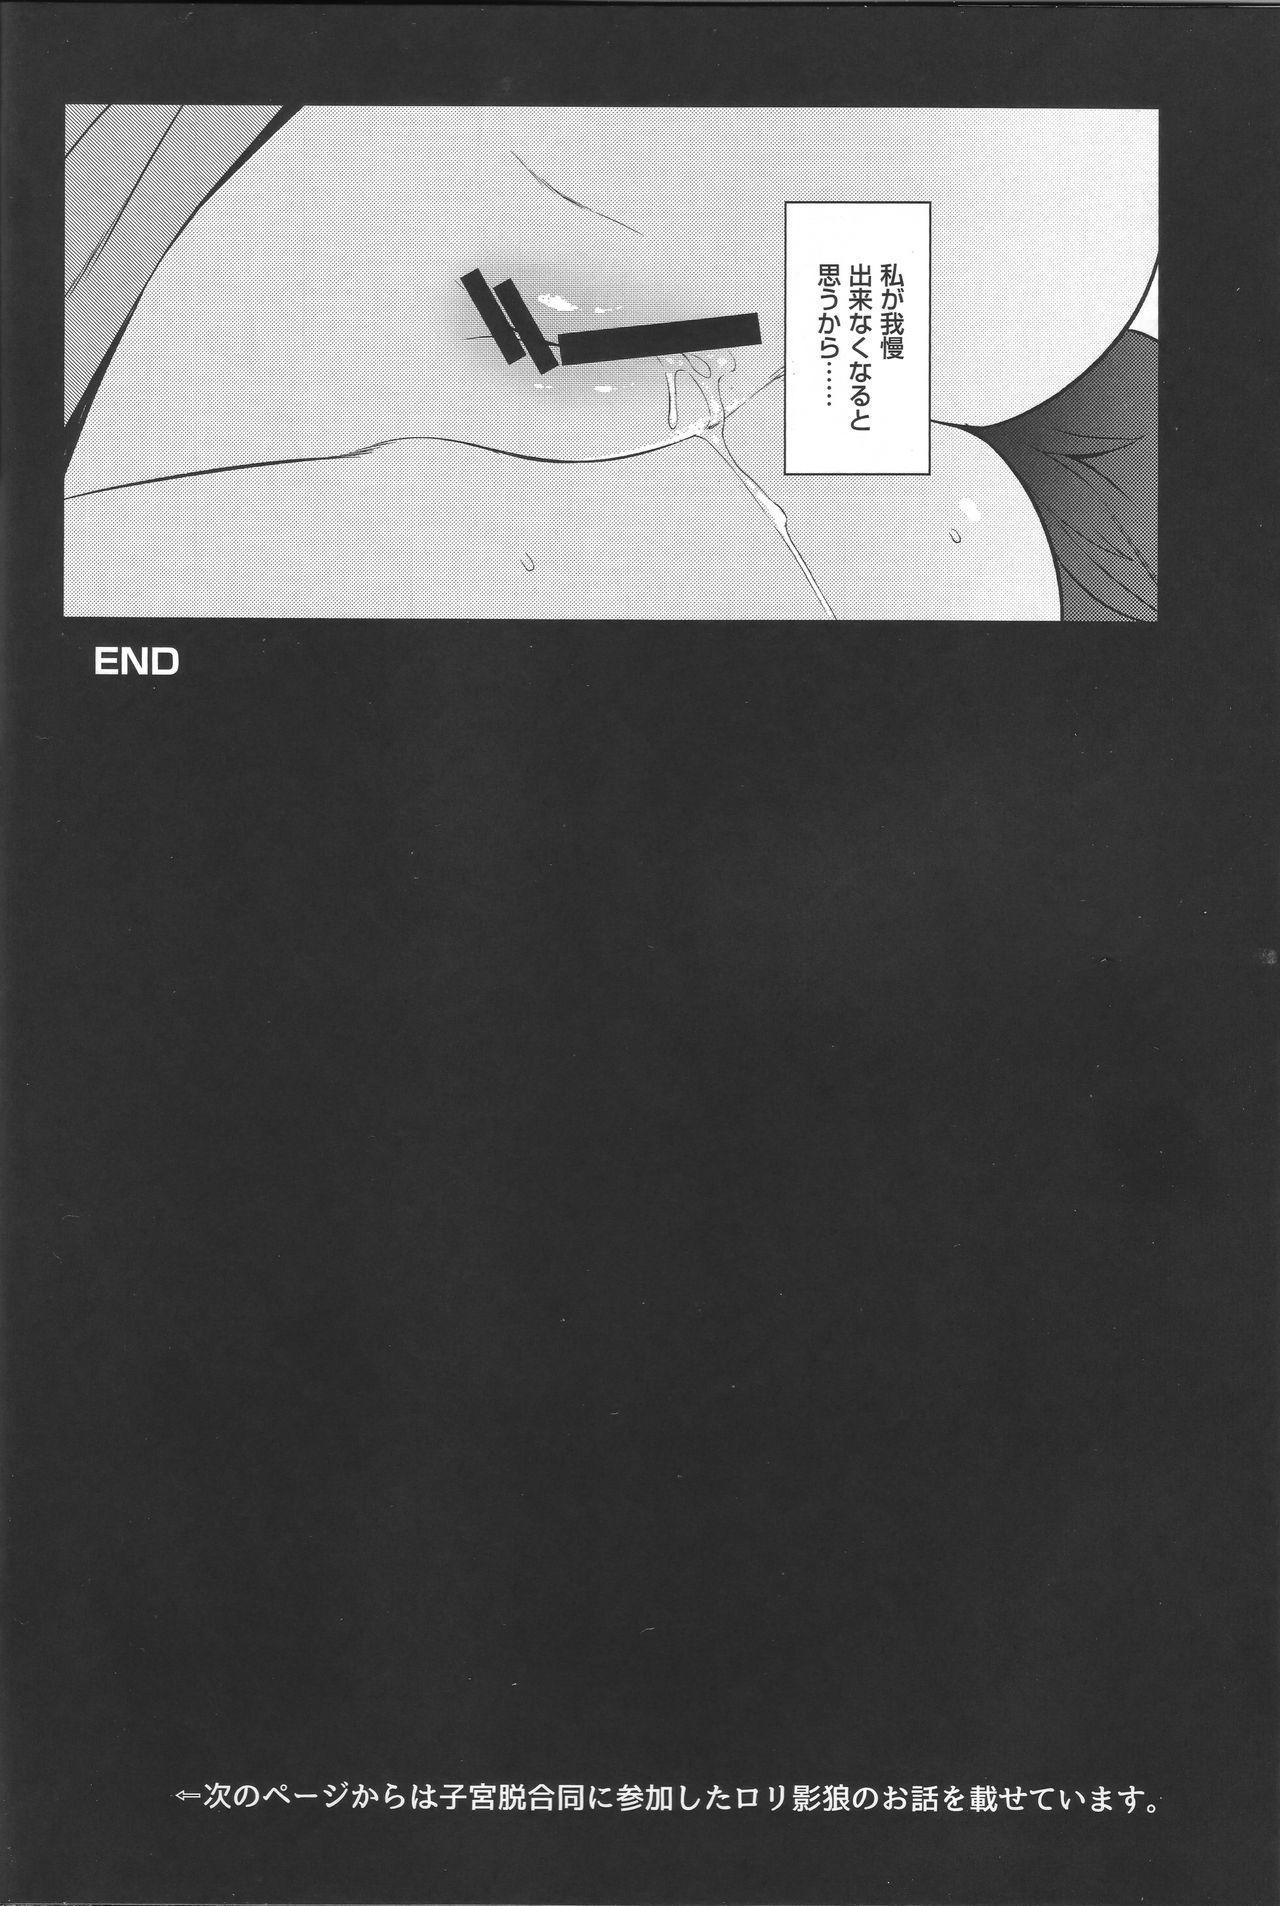 Kagerou Onee-san to Hatsujou Hoikuki + C93 Omake Bon 7